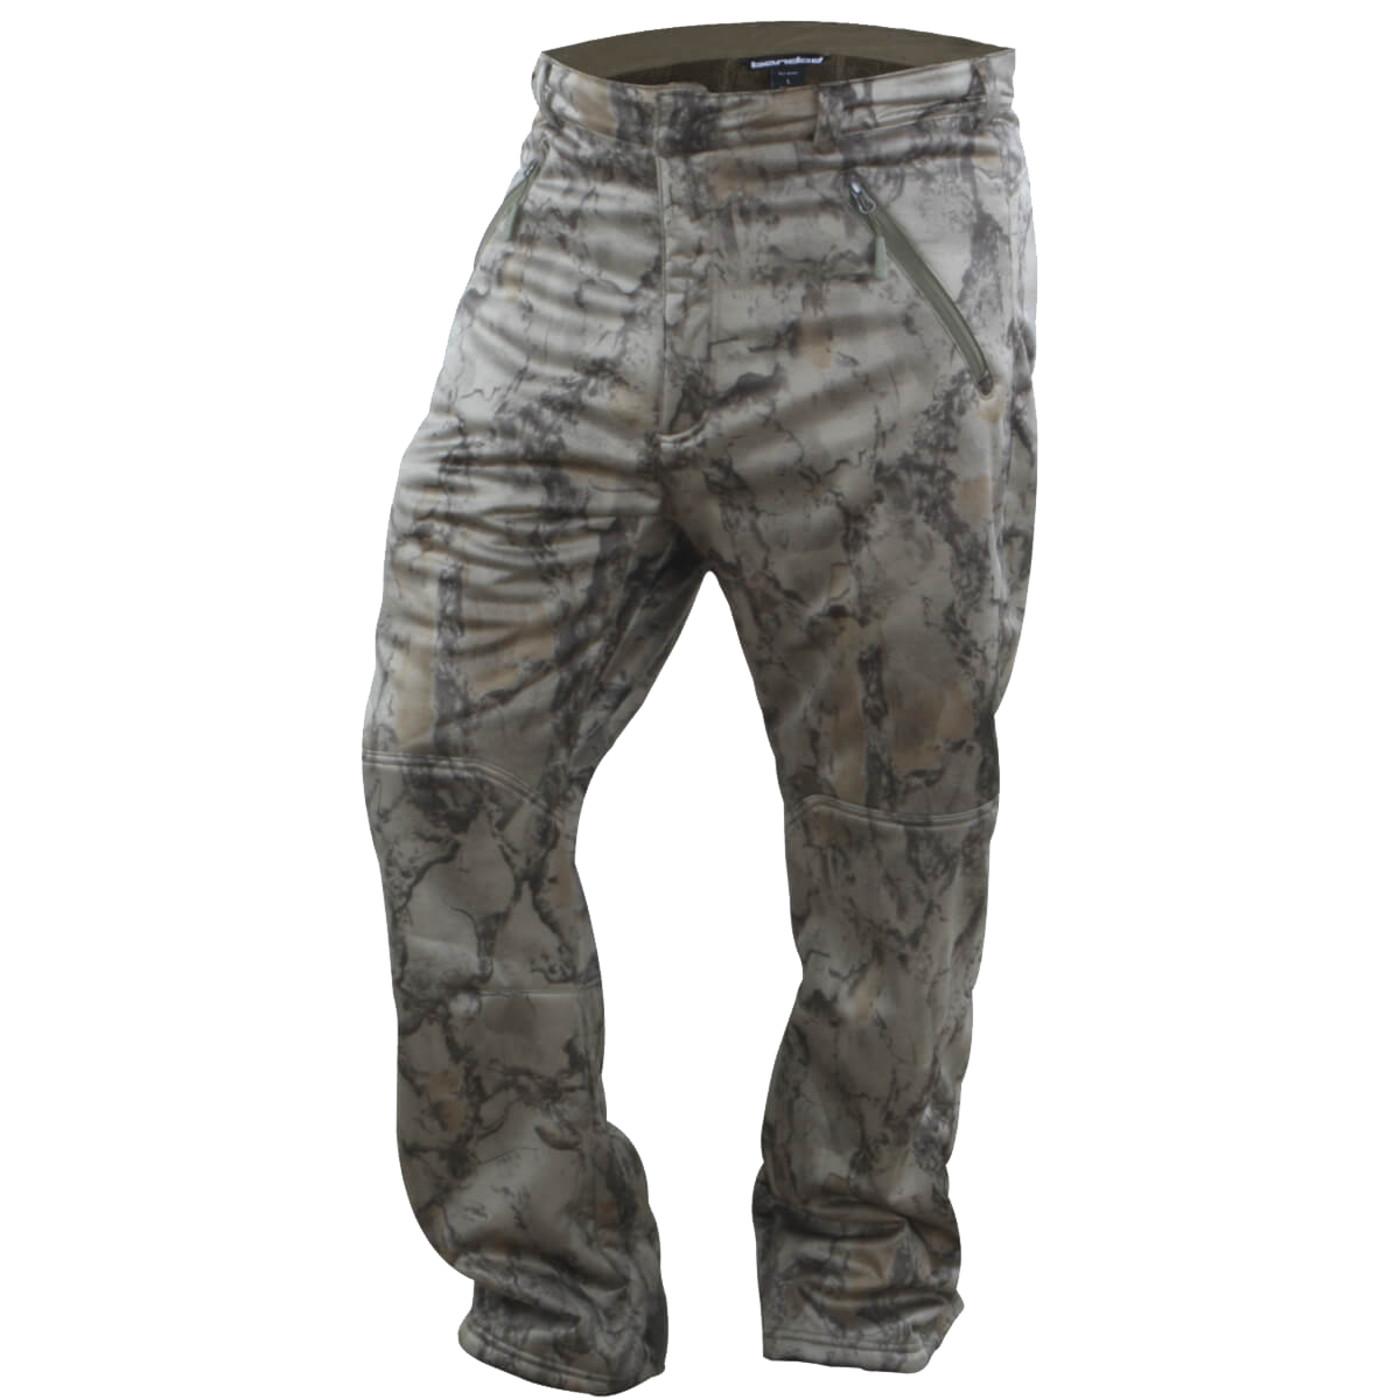 1cfef3e1bea07 Banded White River Wader Pants